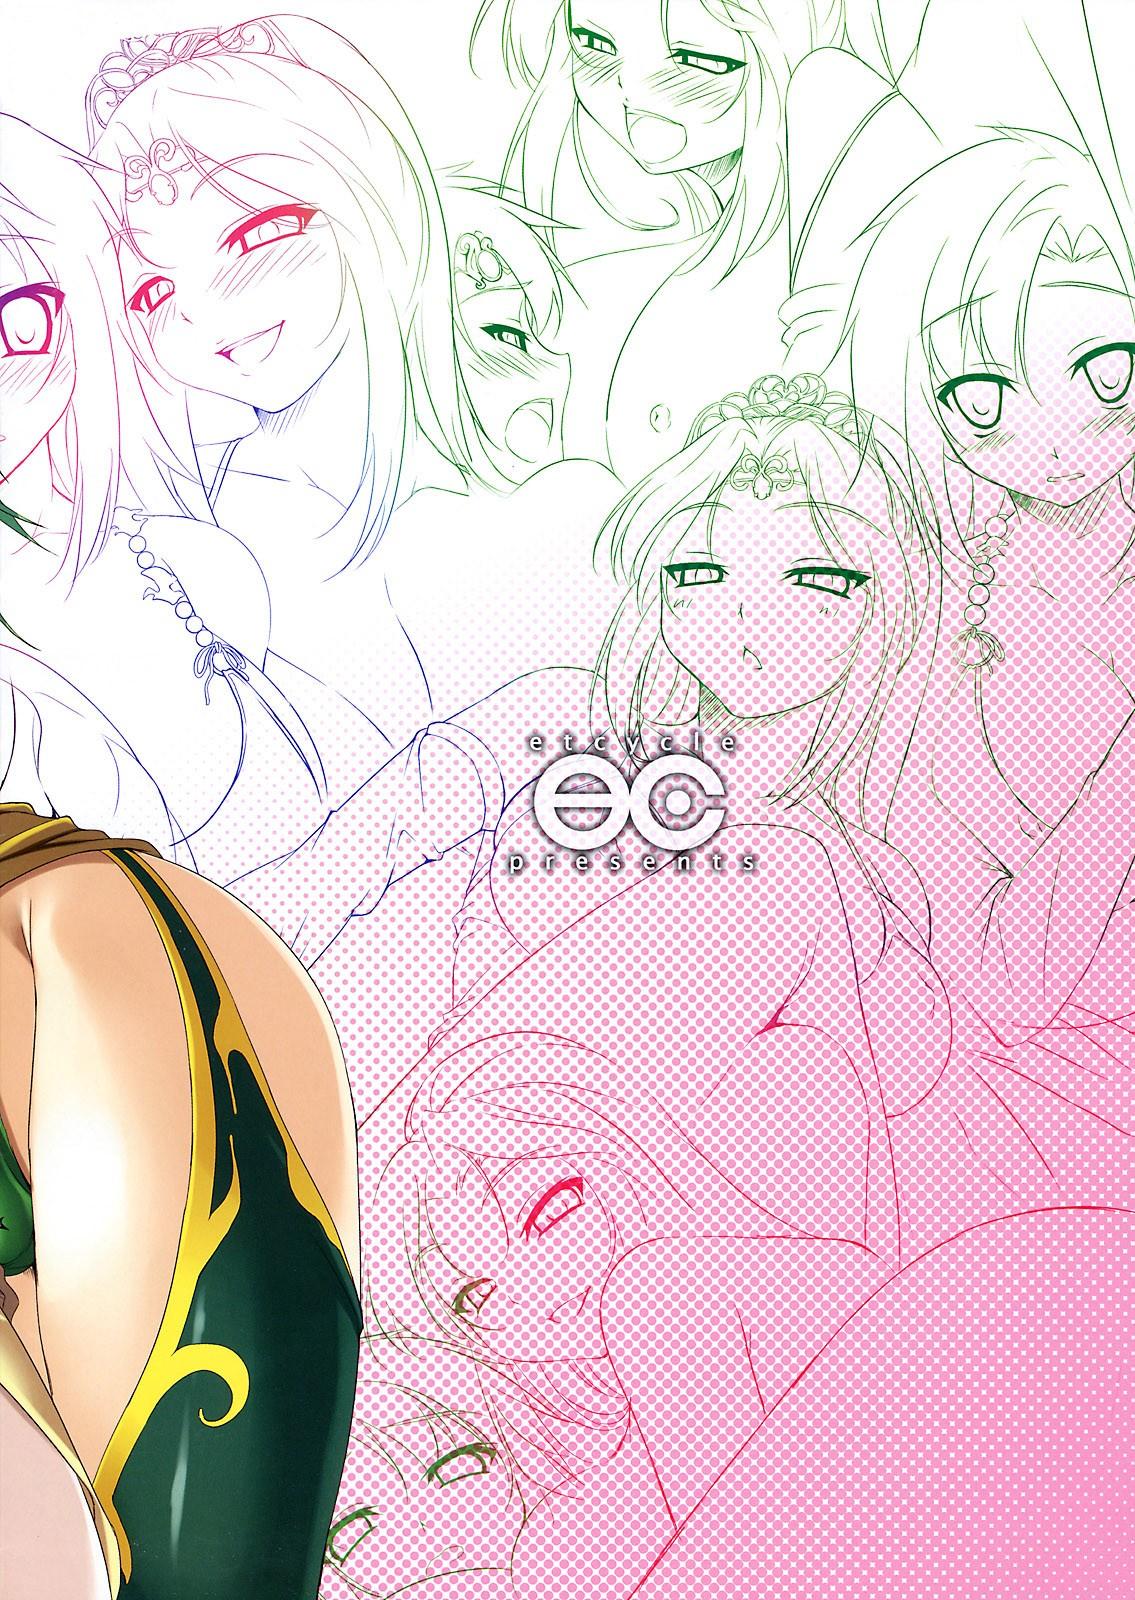 CL-orz-2-Final-Fantasy-IV-15.jpg